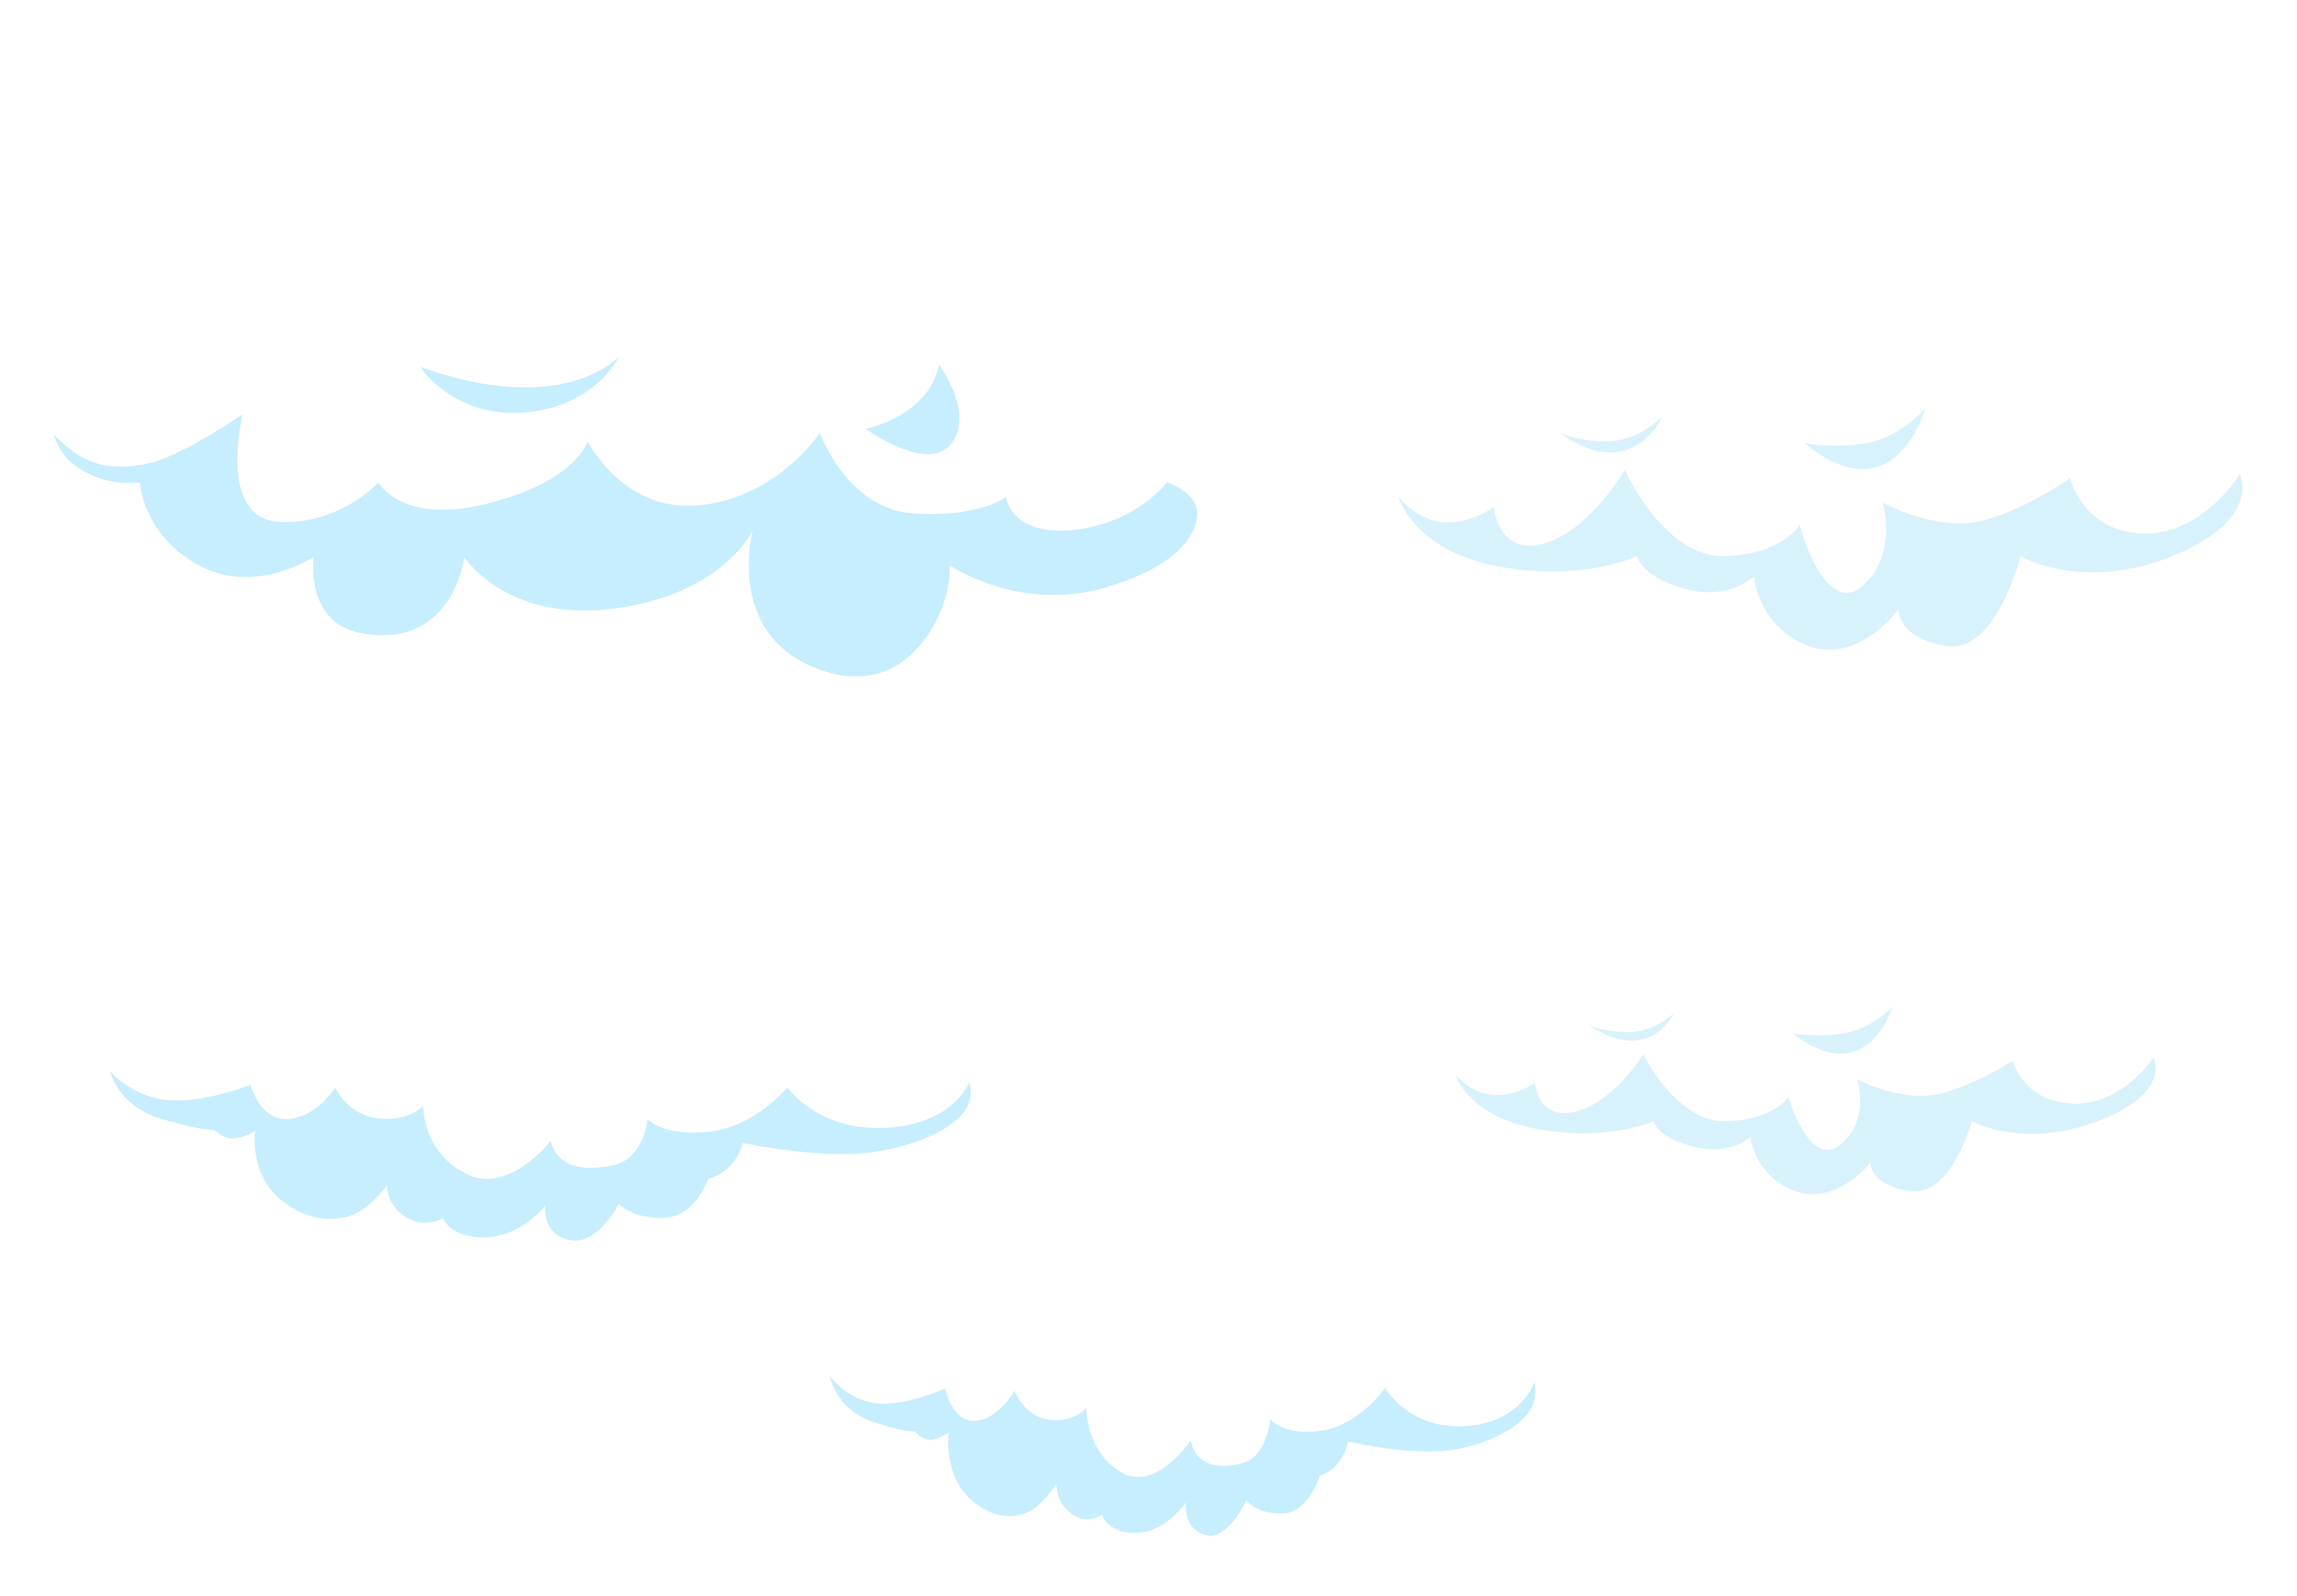 Cloudy clipart puffy cloud. Cartoon clouds set transparent